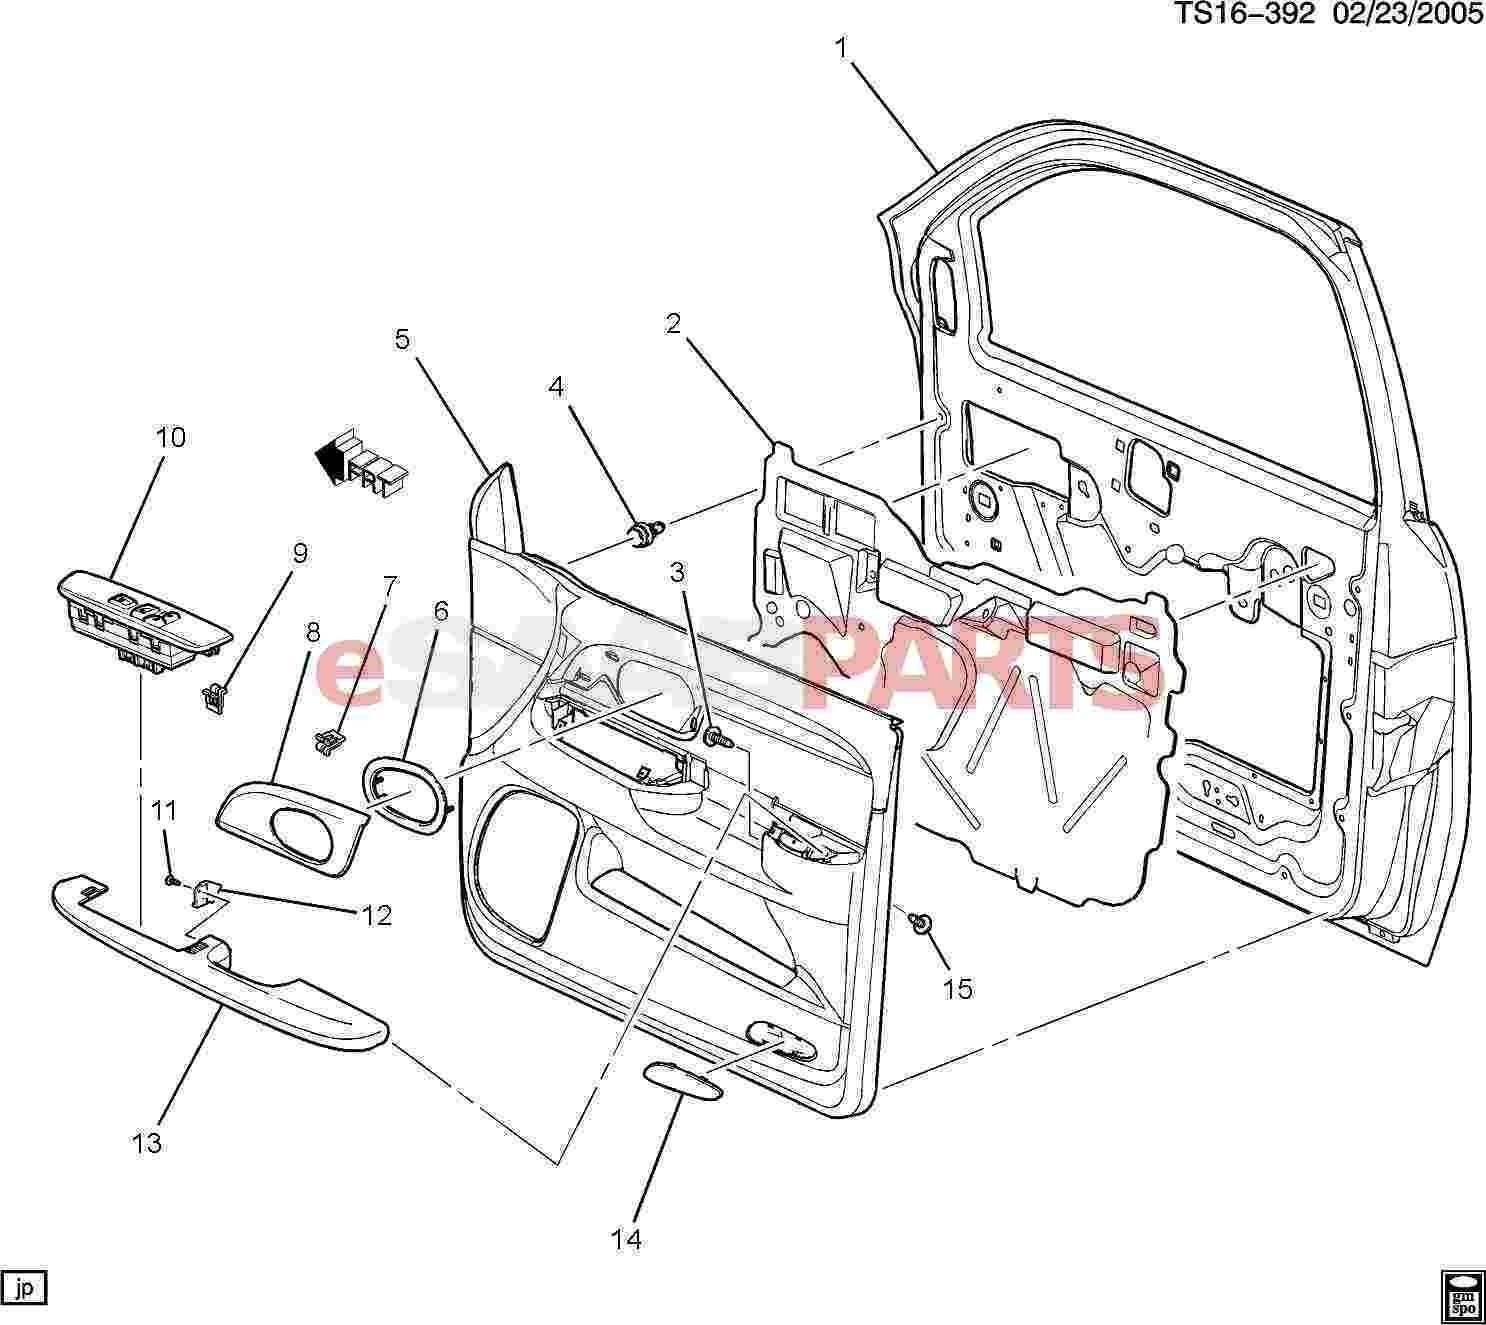 detailed diagram of car parts basic diagram car parts